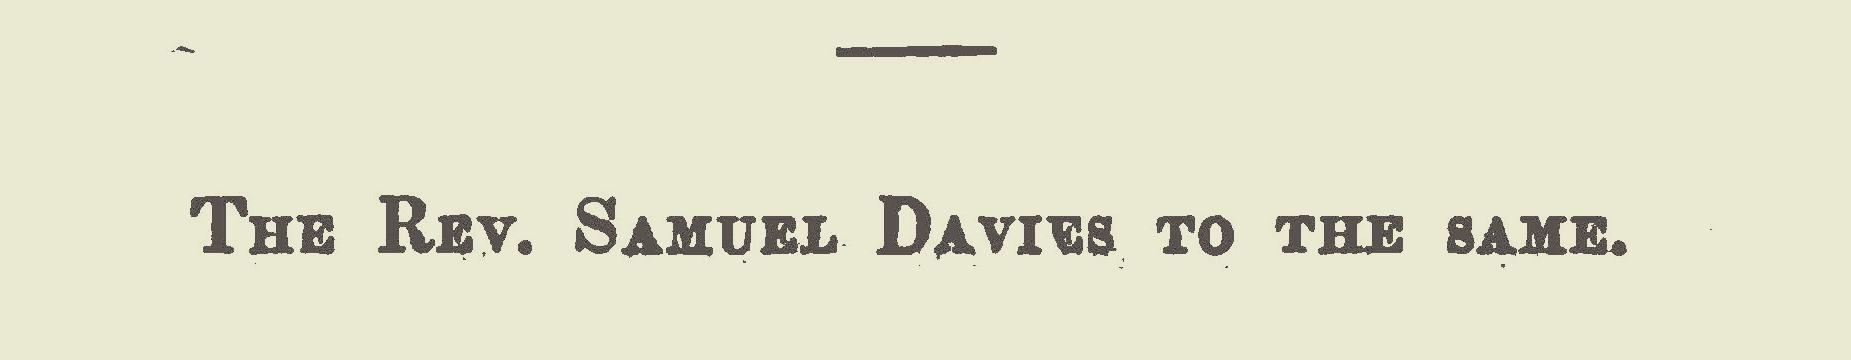 Davies, Samuel, September 29, 1753 Letter to Joseph Bellamy Title Page.jpg